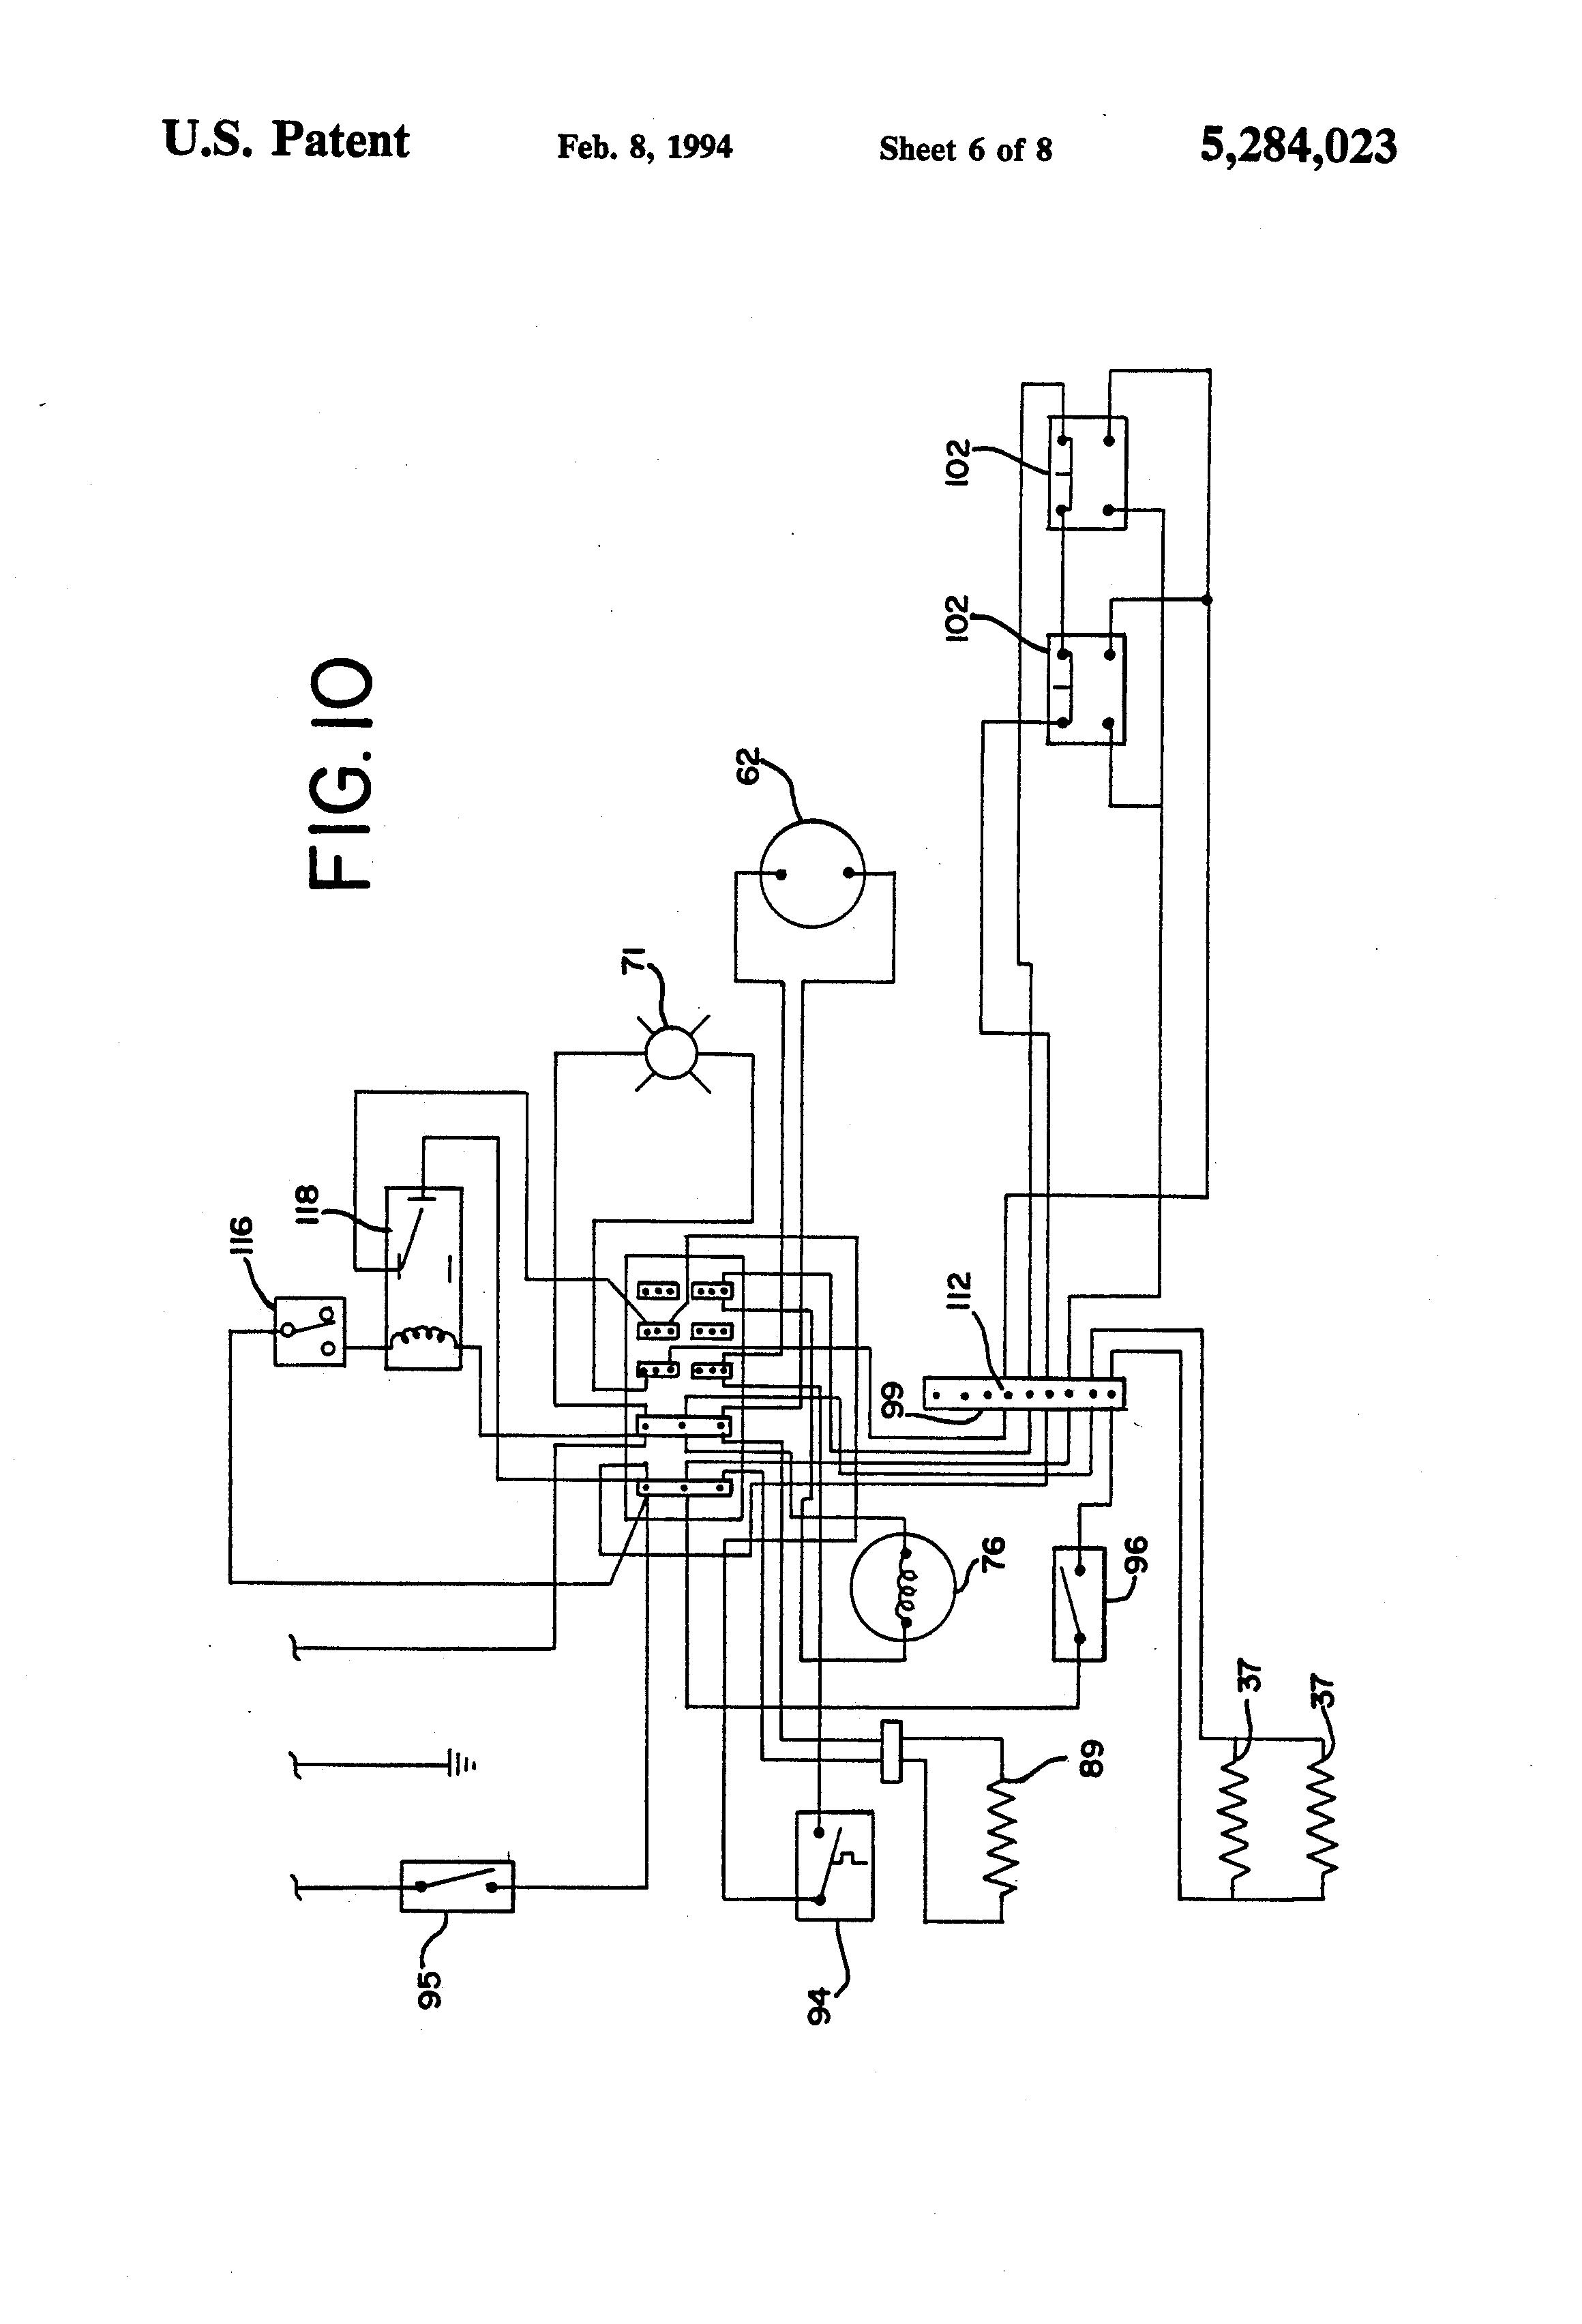 Russell Evaporator Wiring Diagram Ae16